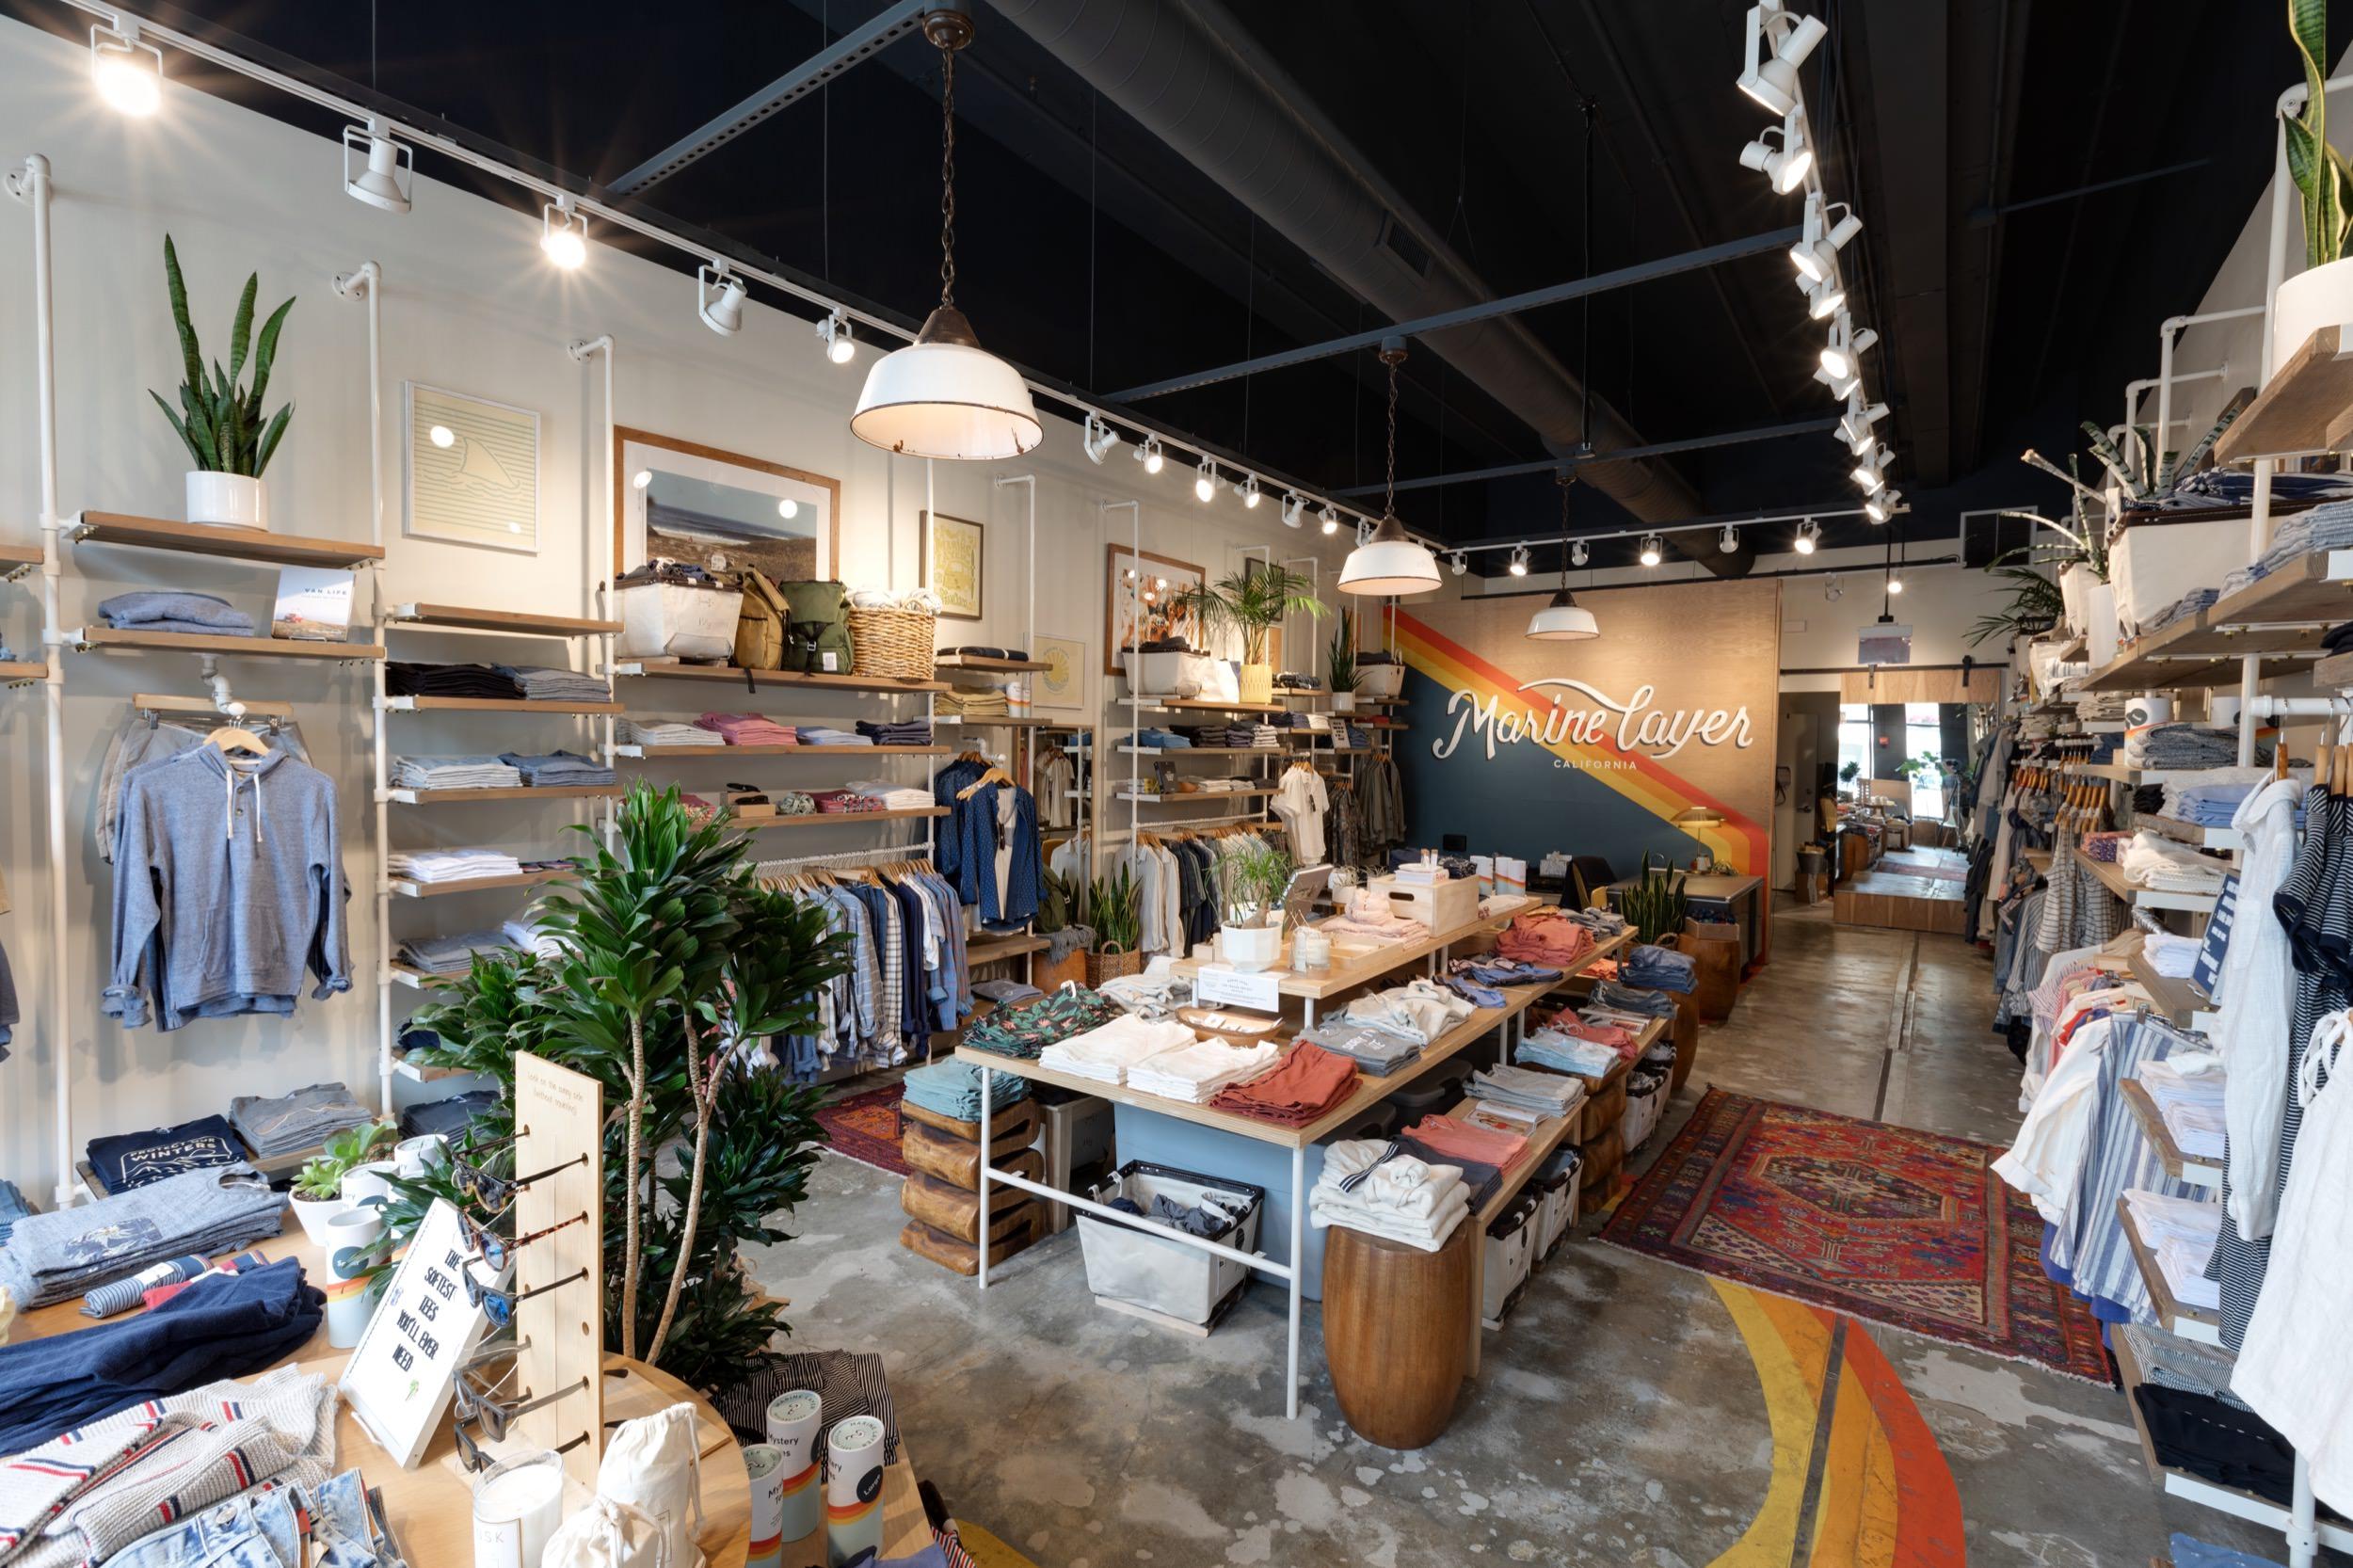 Retail space at Marine Layer